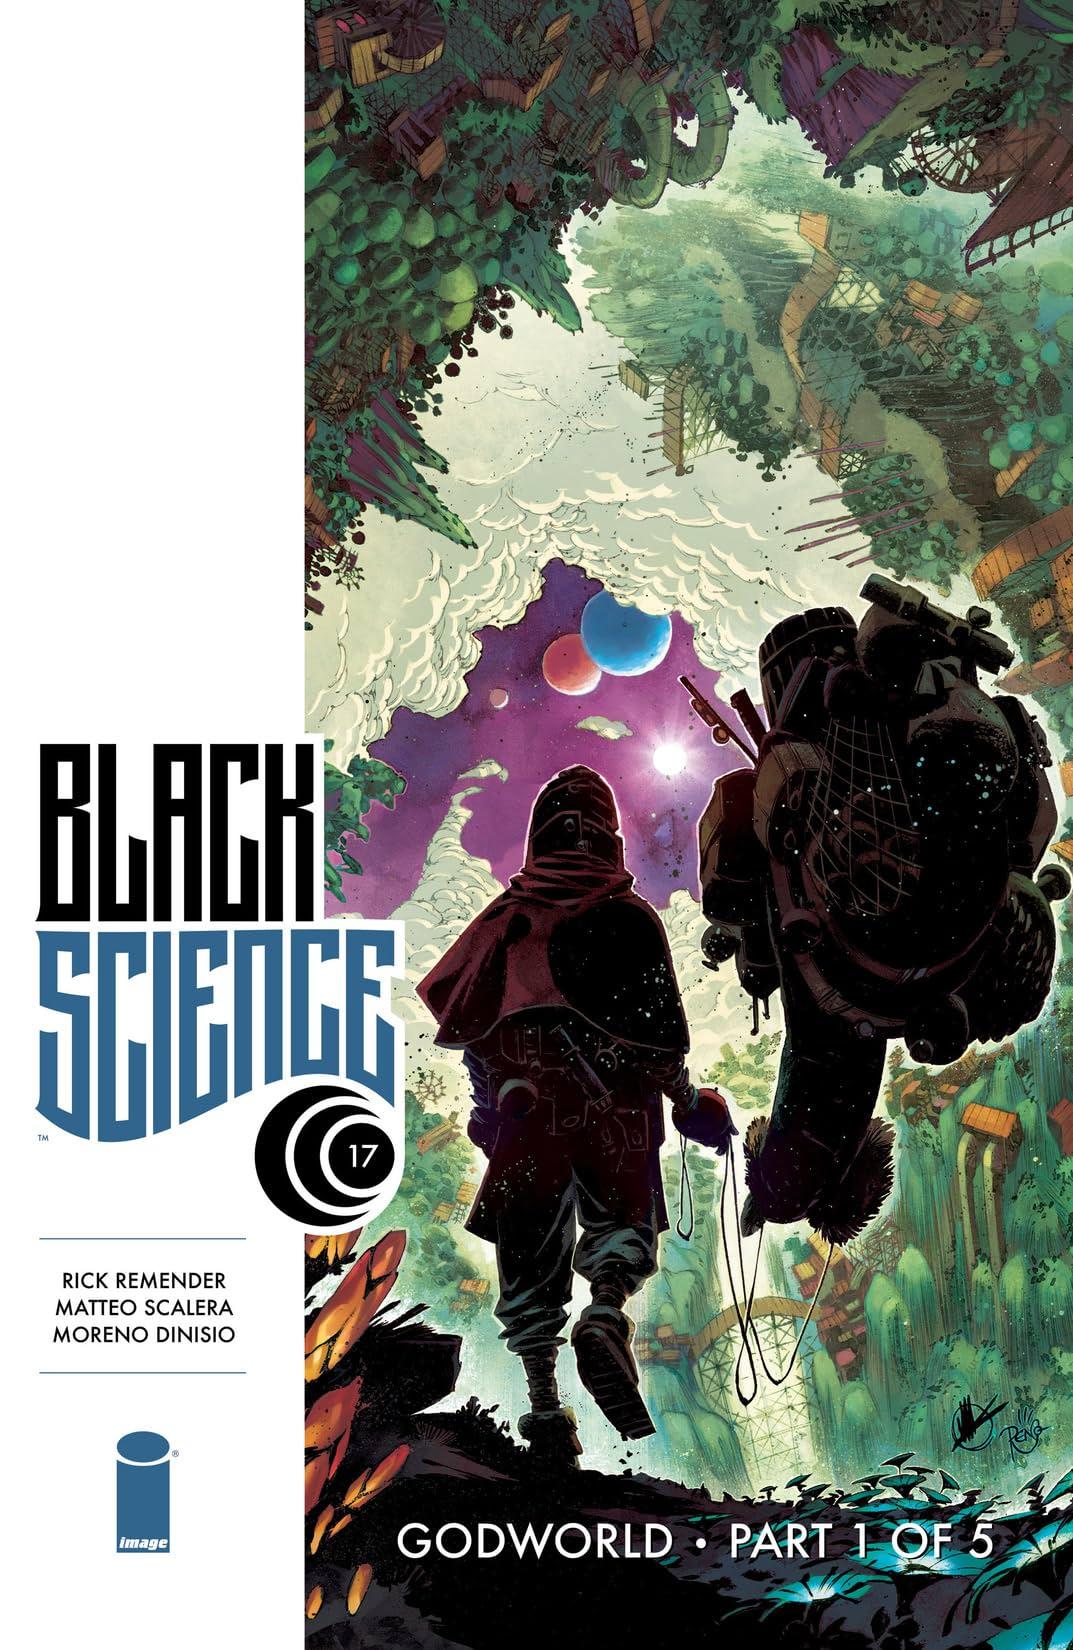 Black Science #17